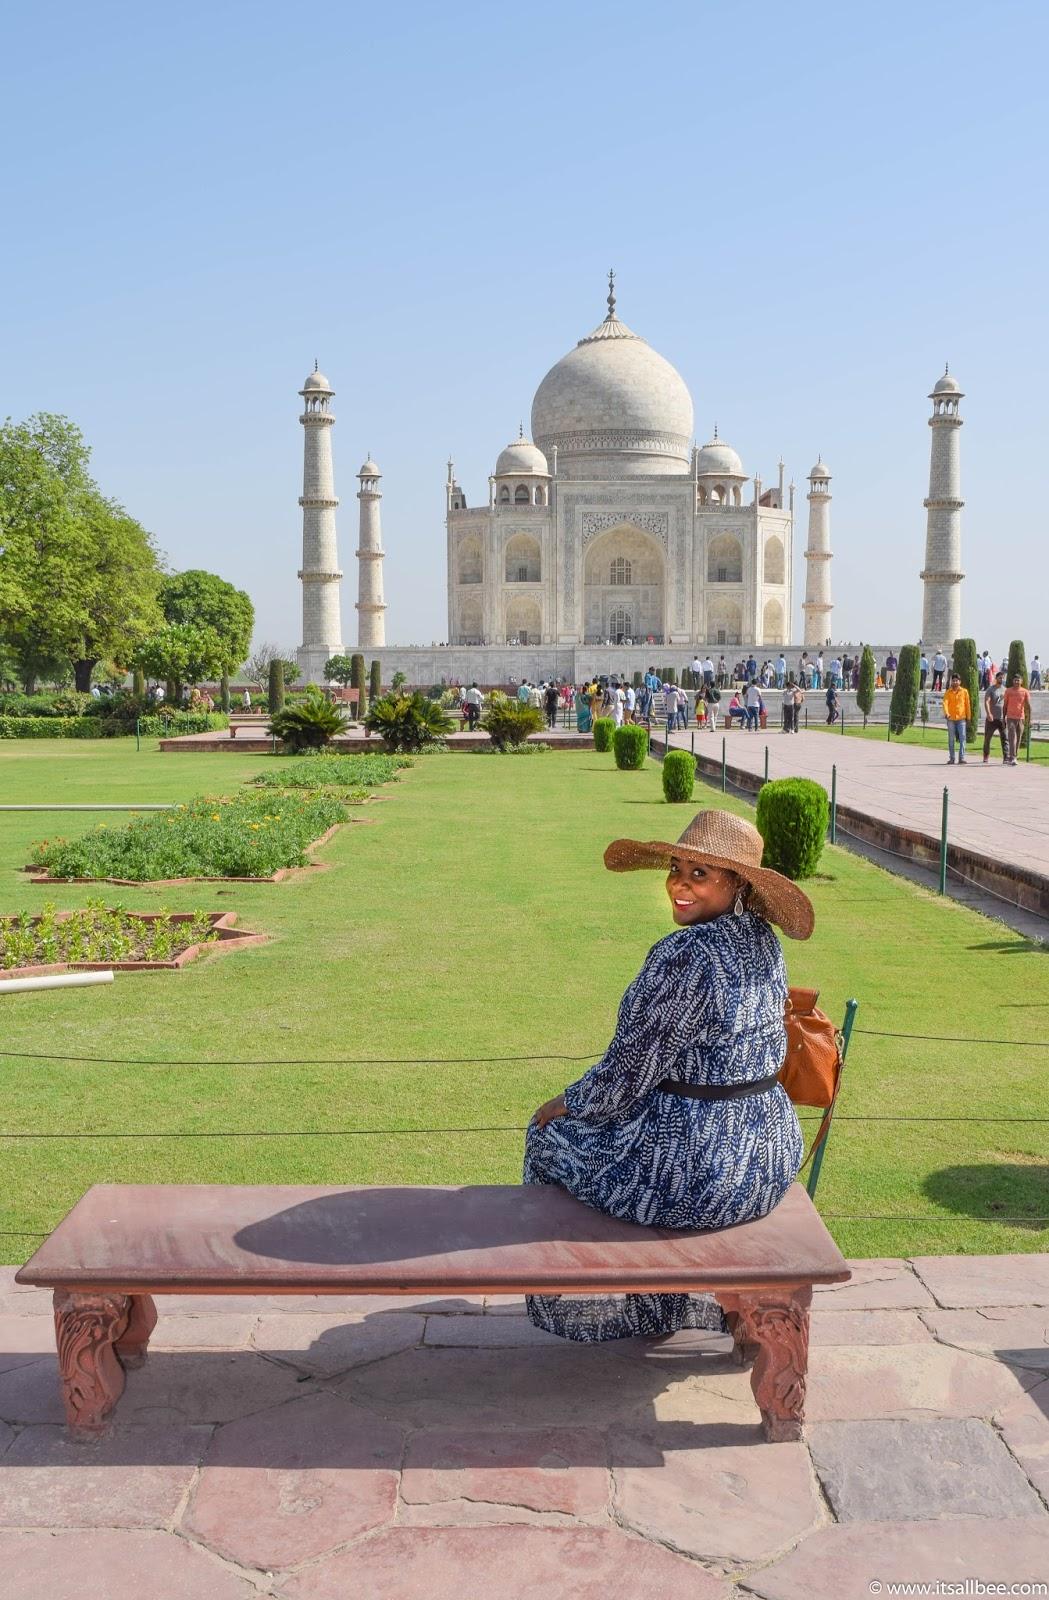 Taj Mahal,  Agra - India. Photo by Bianca - www.itsallbee.com